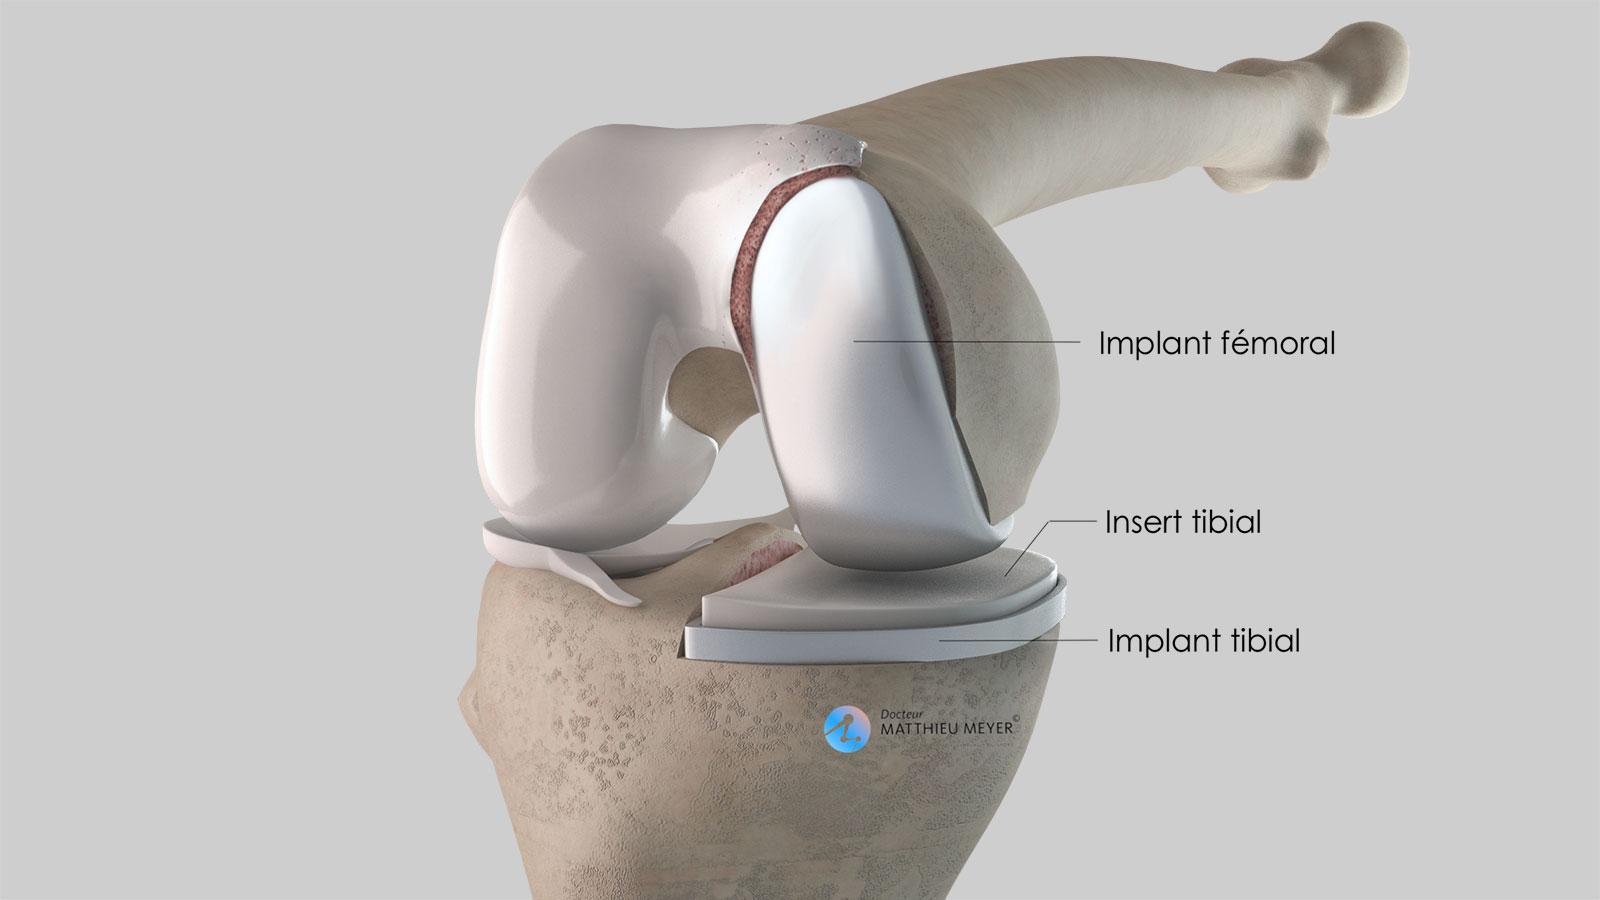 Prothèse unicompartimentale de genou